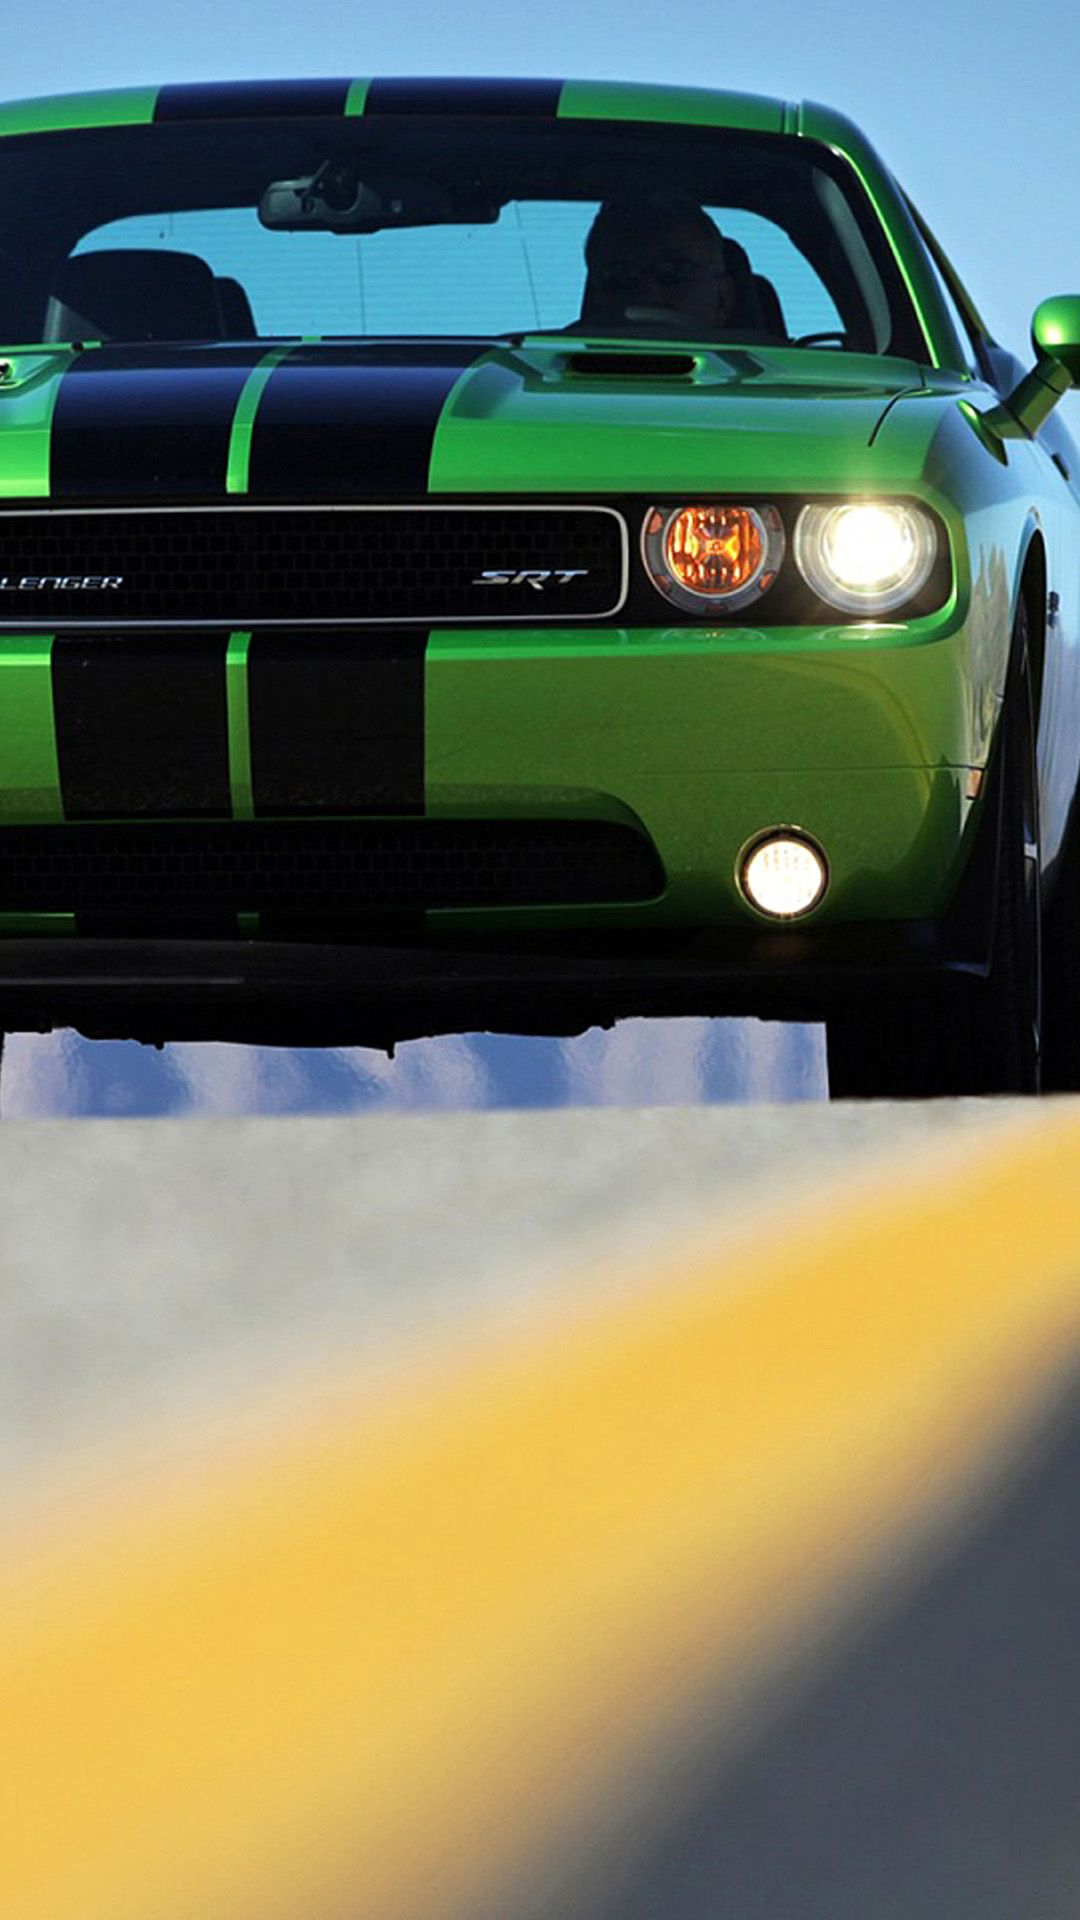 Green Dodge Challenger Hd Wallpaper Iphone Plus